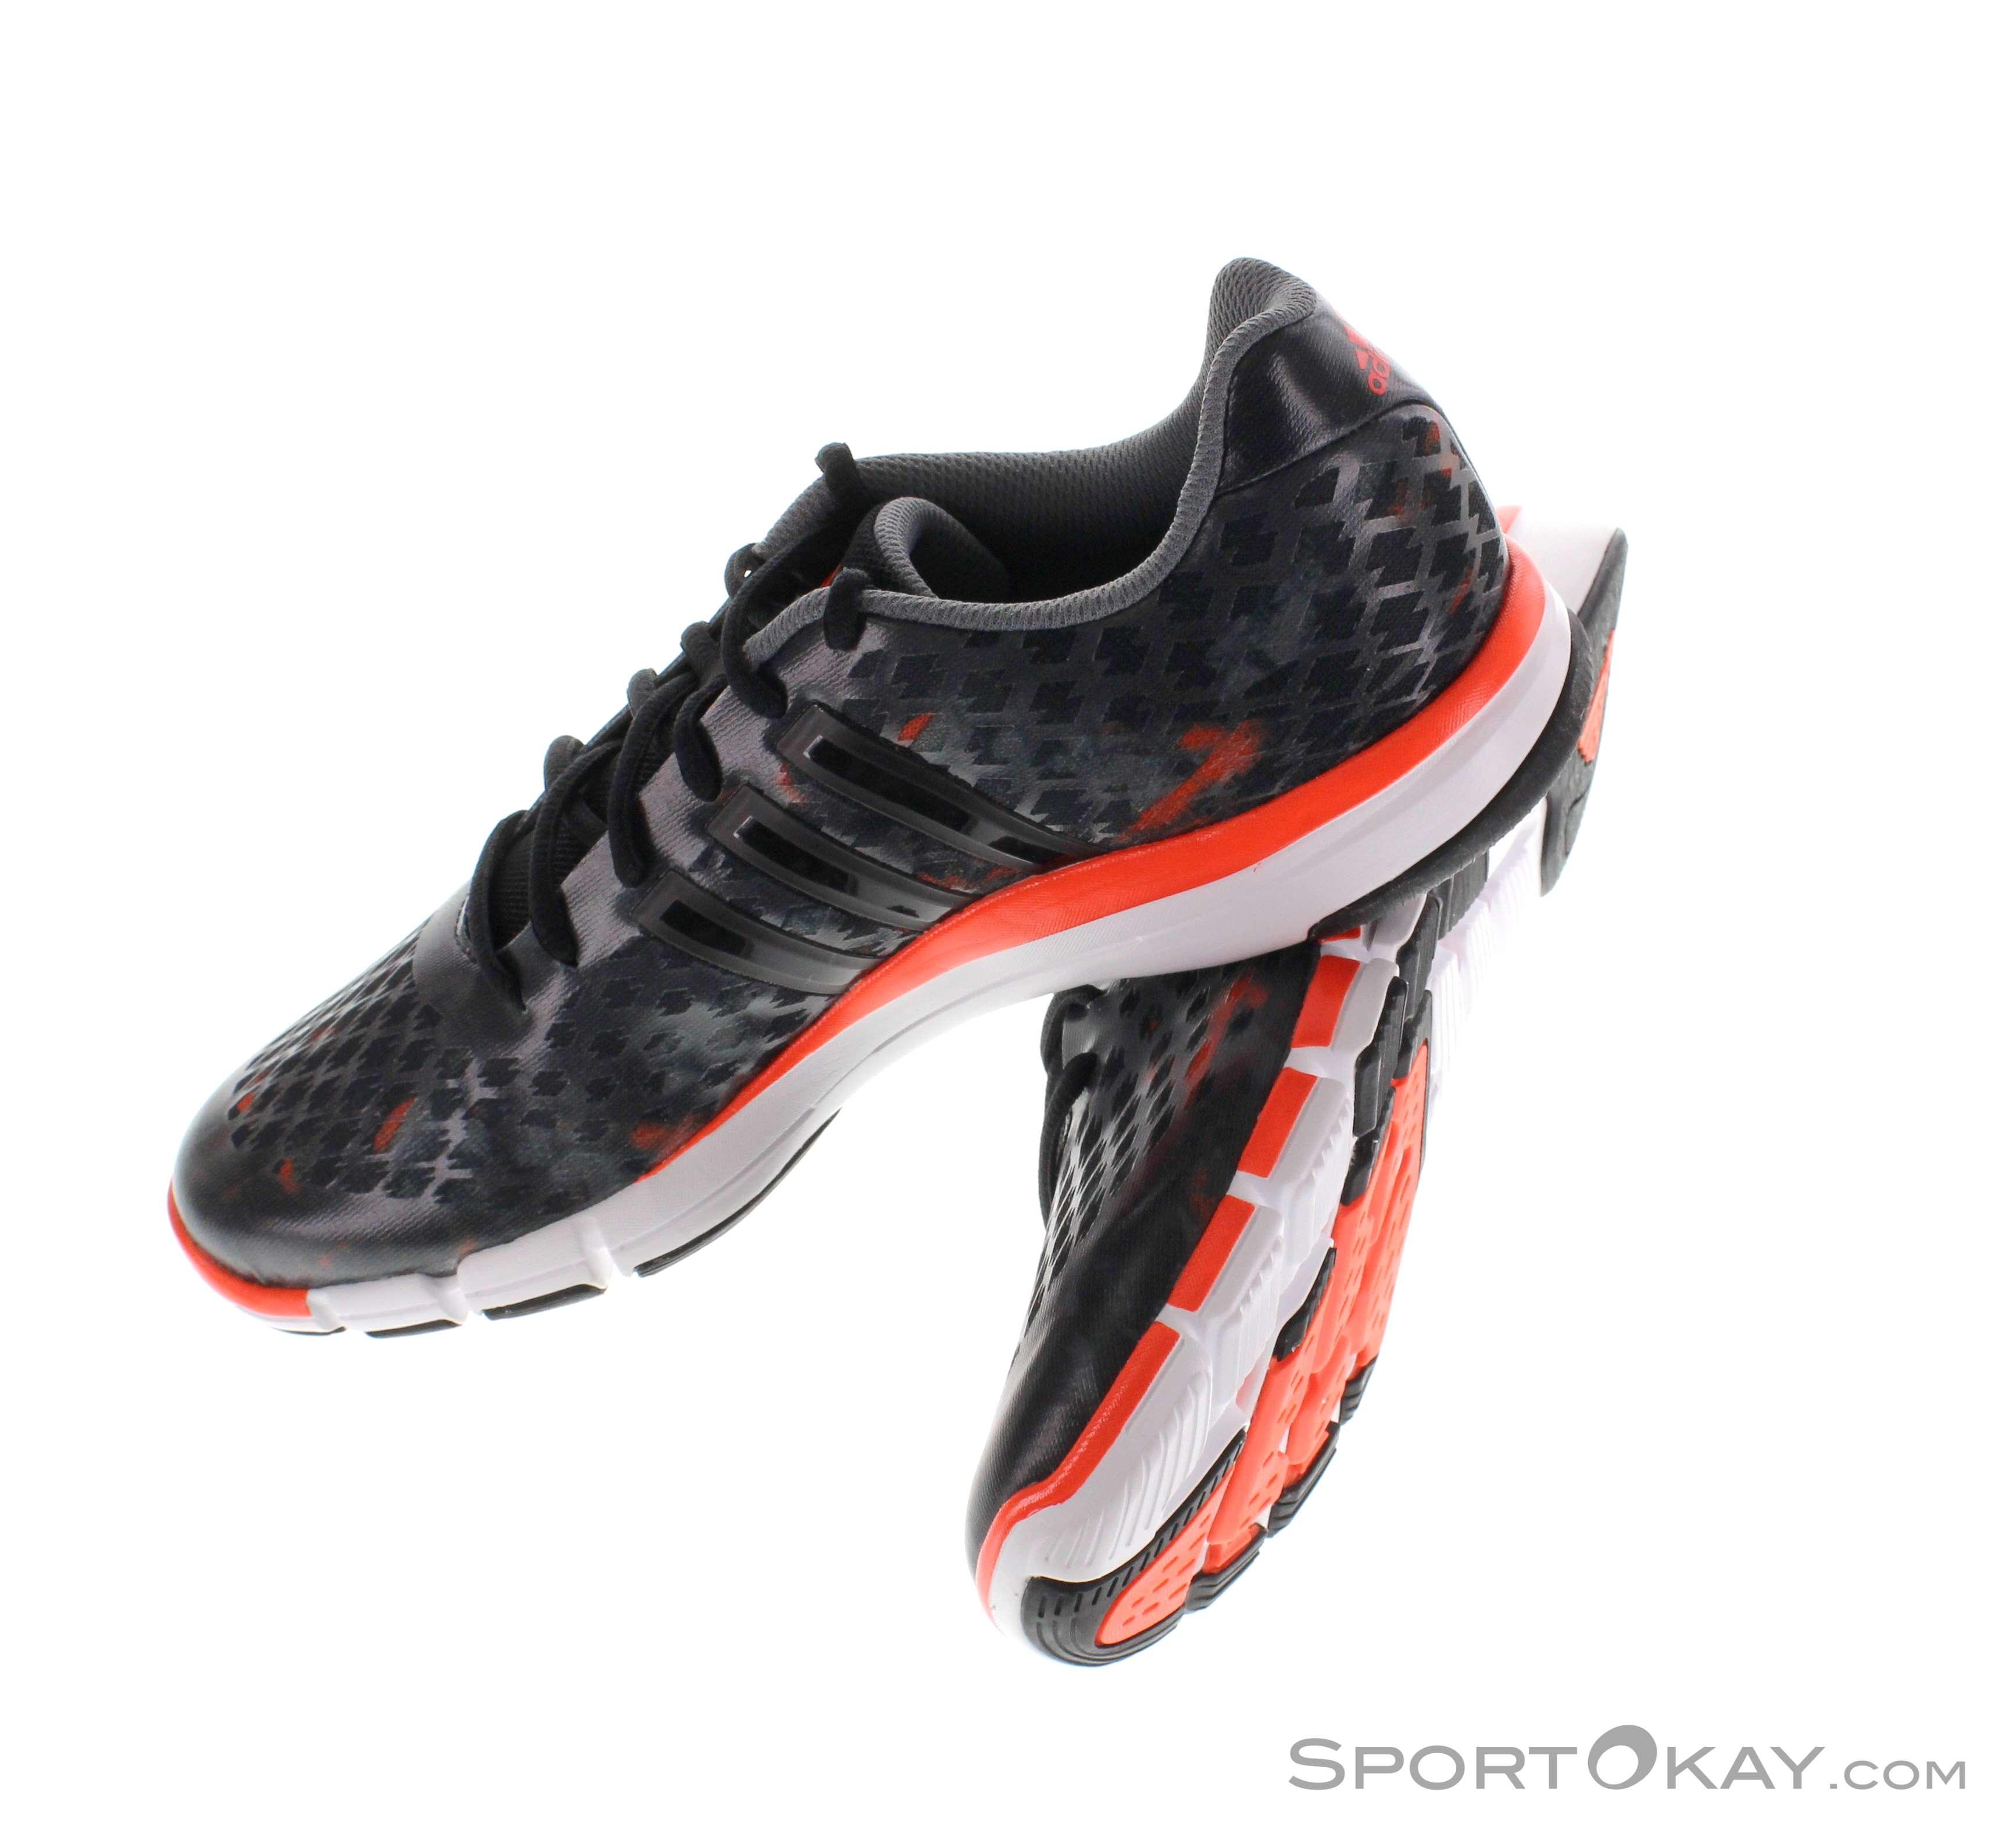 Herren Schuhe Adidas Grau Adipure 360.2 Training Das Neueste